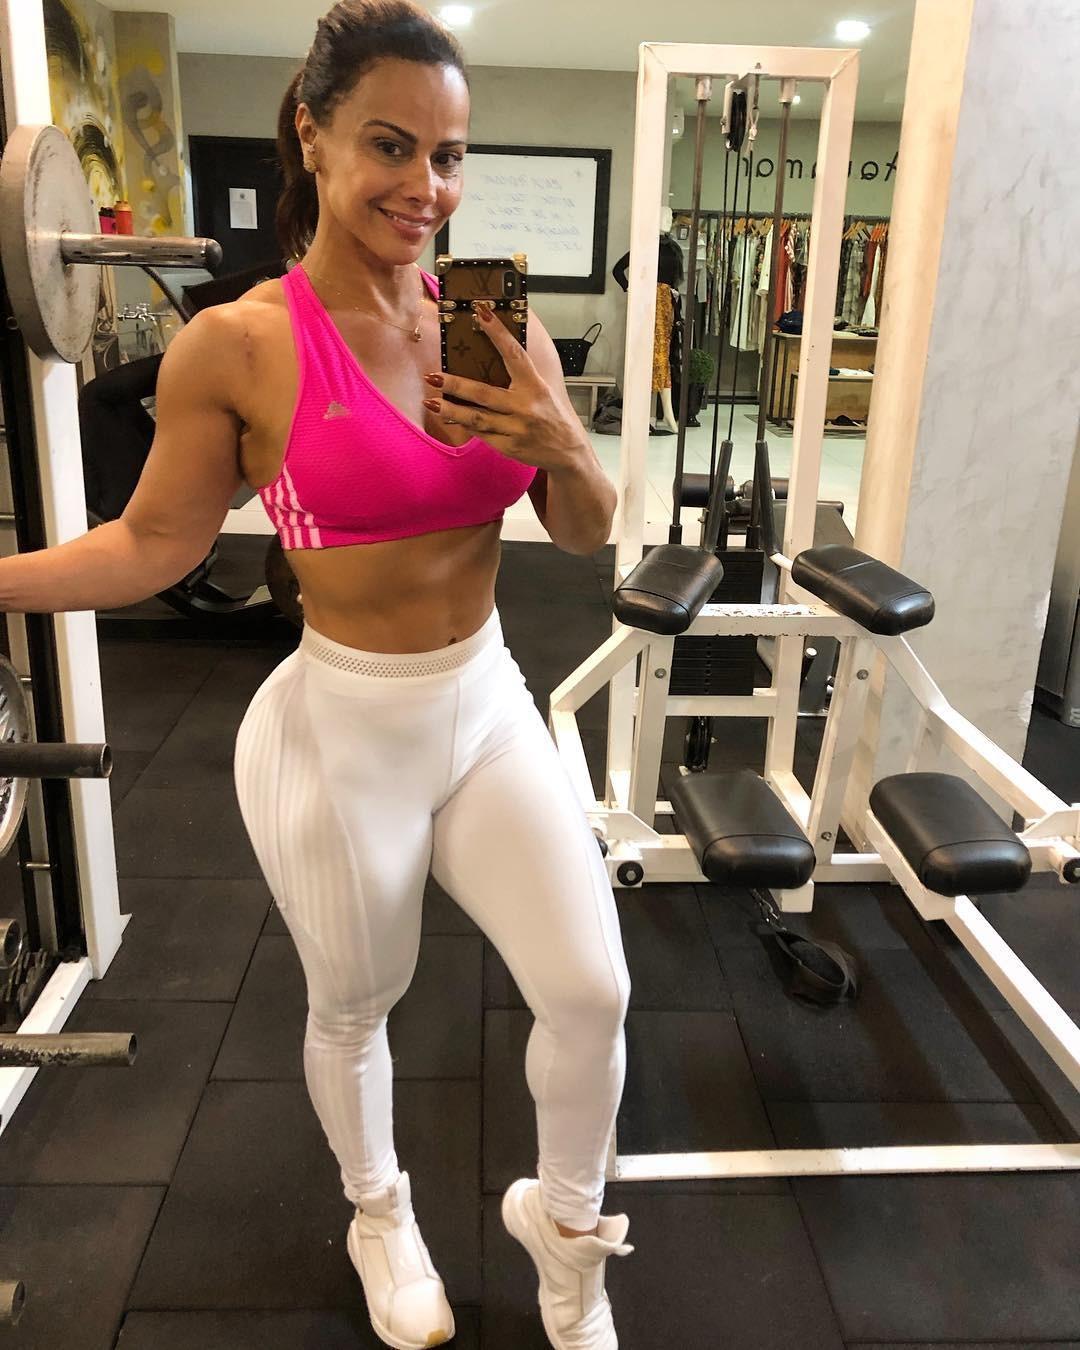 Viviane Araujo Posa Na Academia Com Legenda Motivacional E